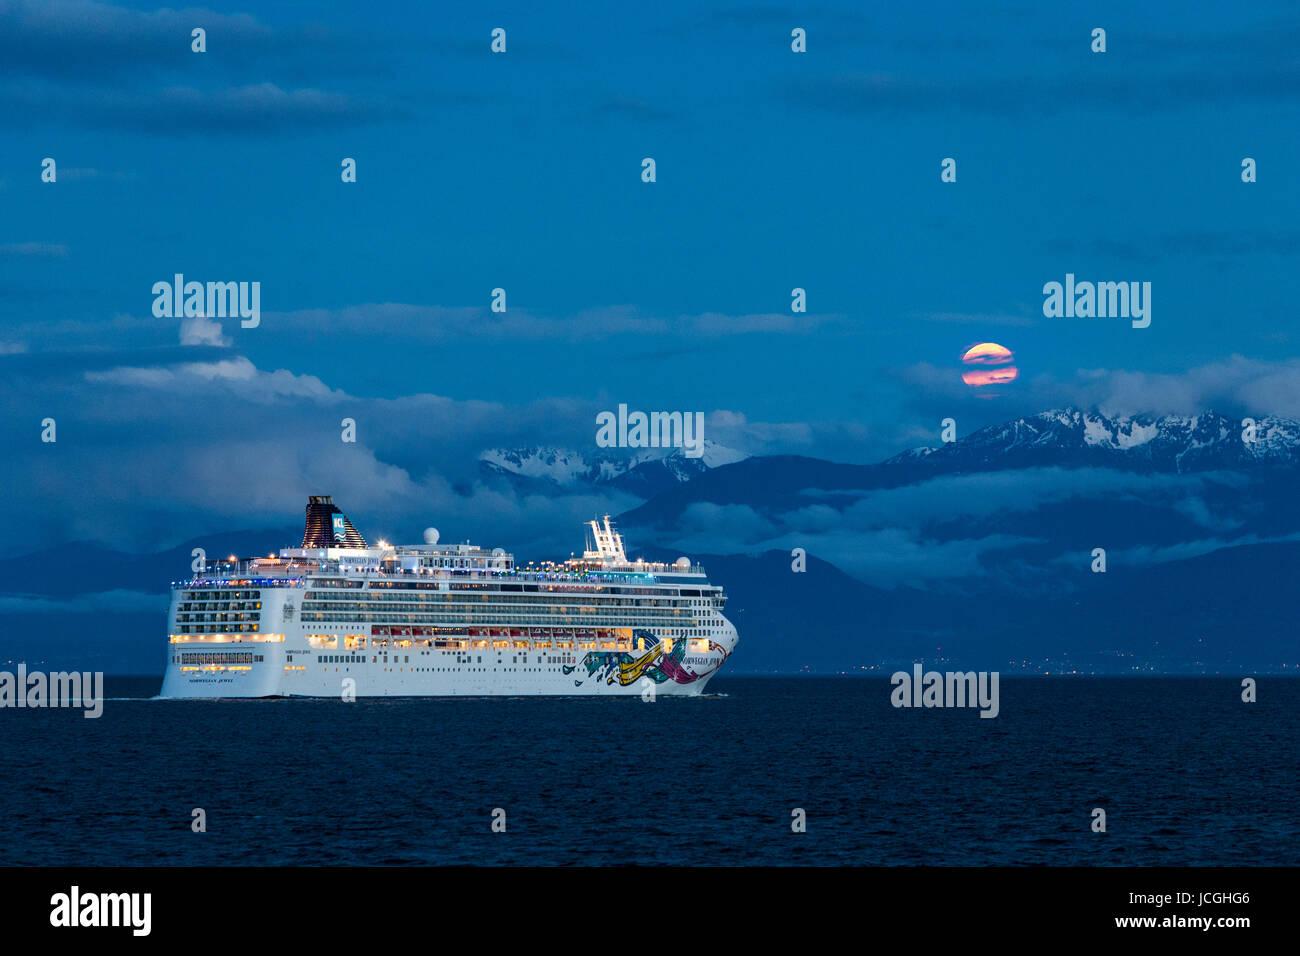 Cruise ship Norwegian Jewel departing port of Victoria at dusk-Victoria, British Columbia, Canada. - Stock Image